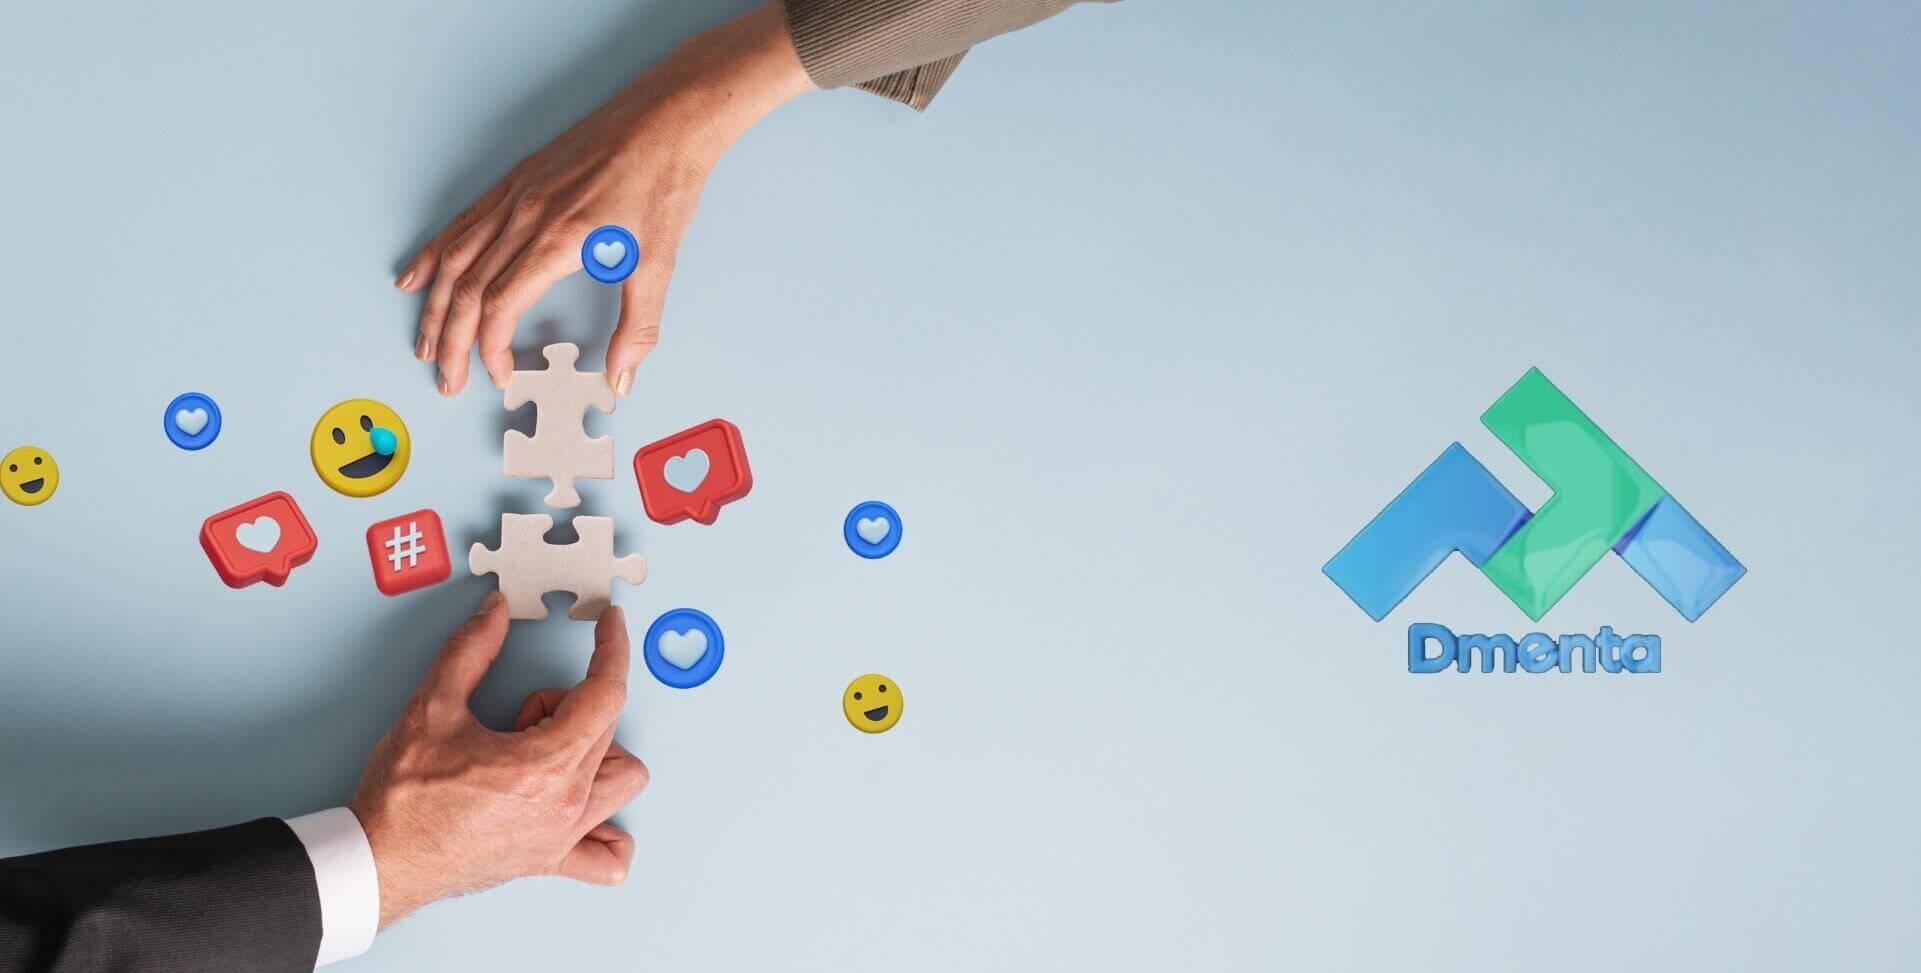 January 2021, Acquired Dmenta to strengthen ArabyAds Influencer Marketing Platform